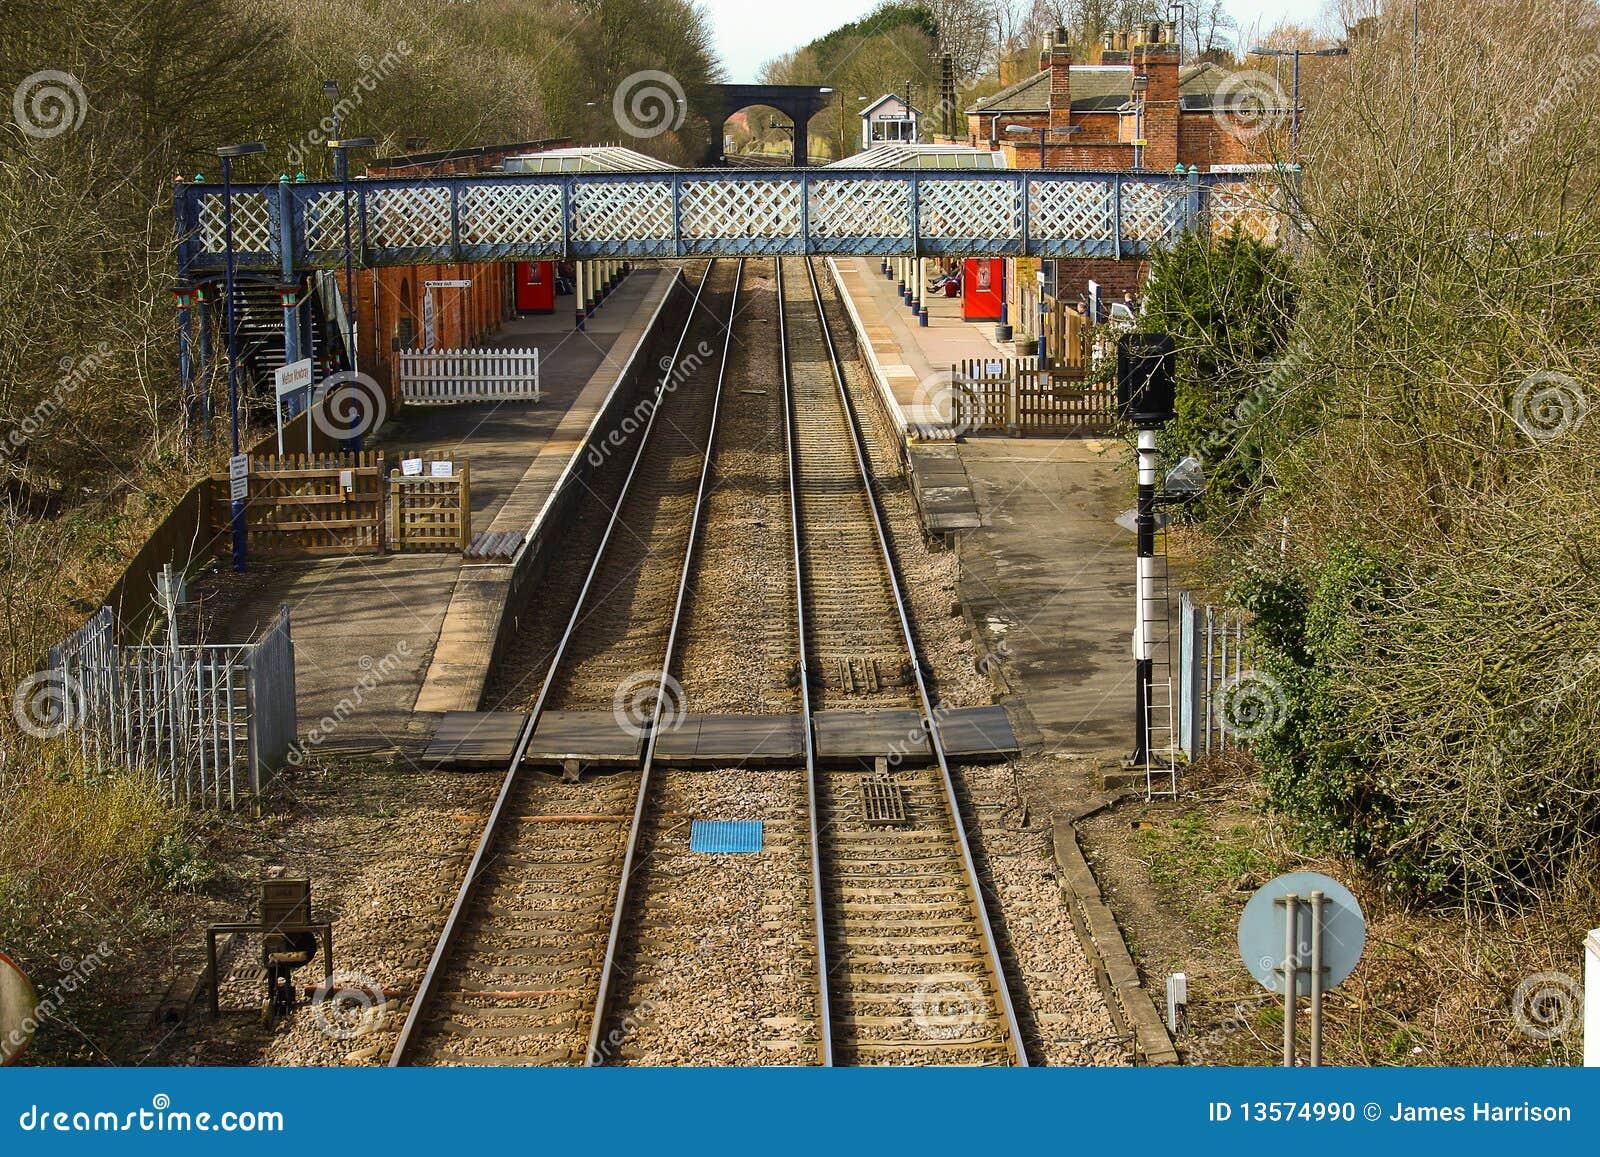 Estação de comboio de Melton Mowbray